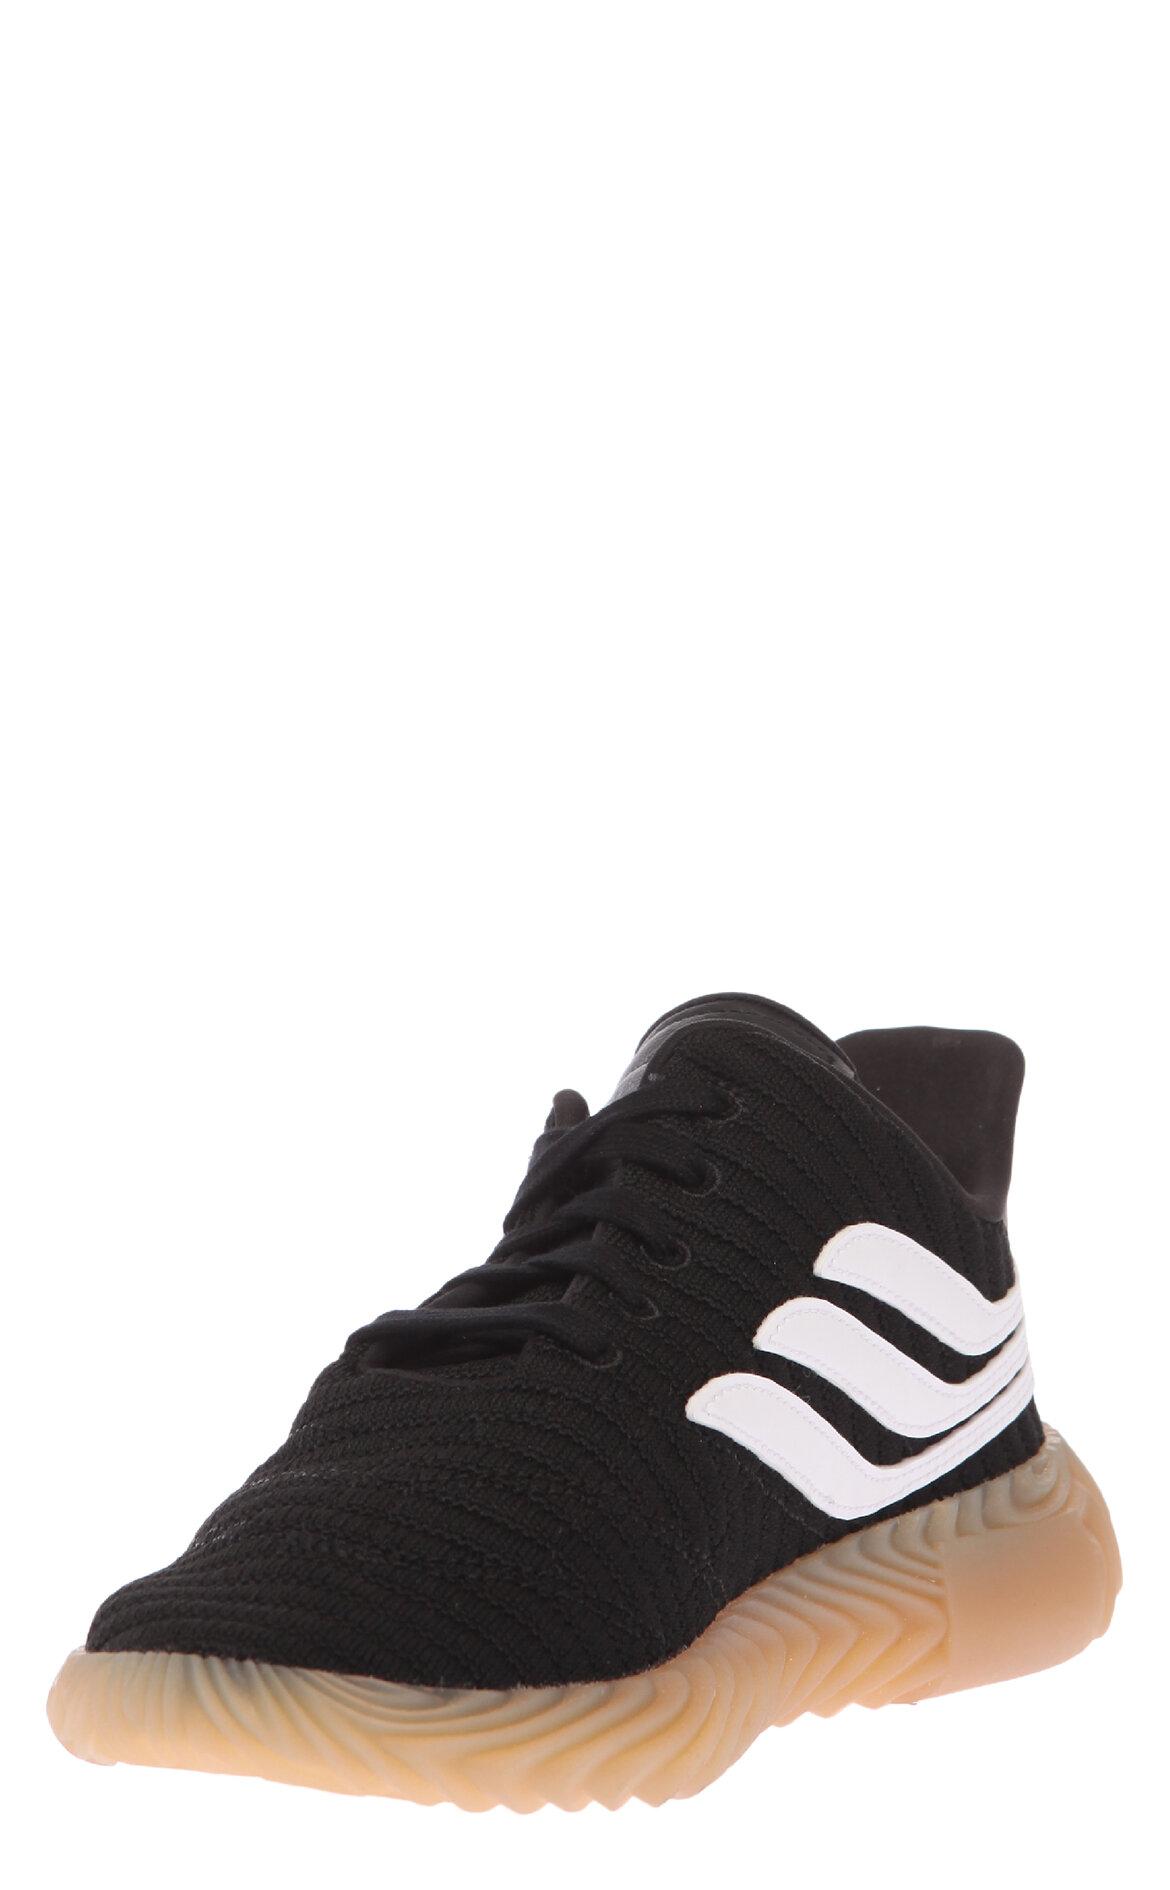 adidas originals sobakov Ayakkabı